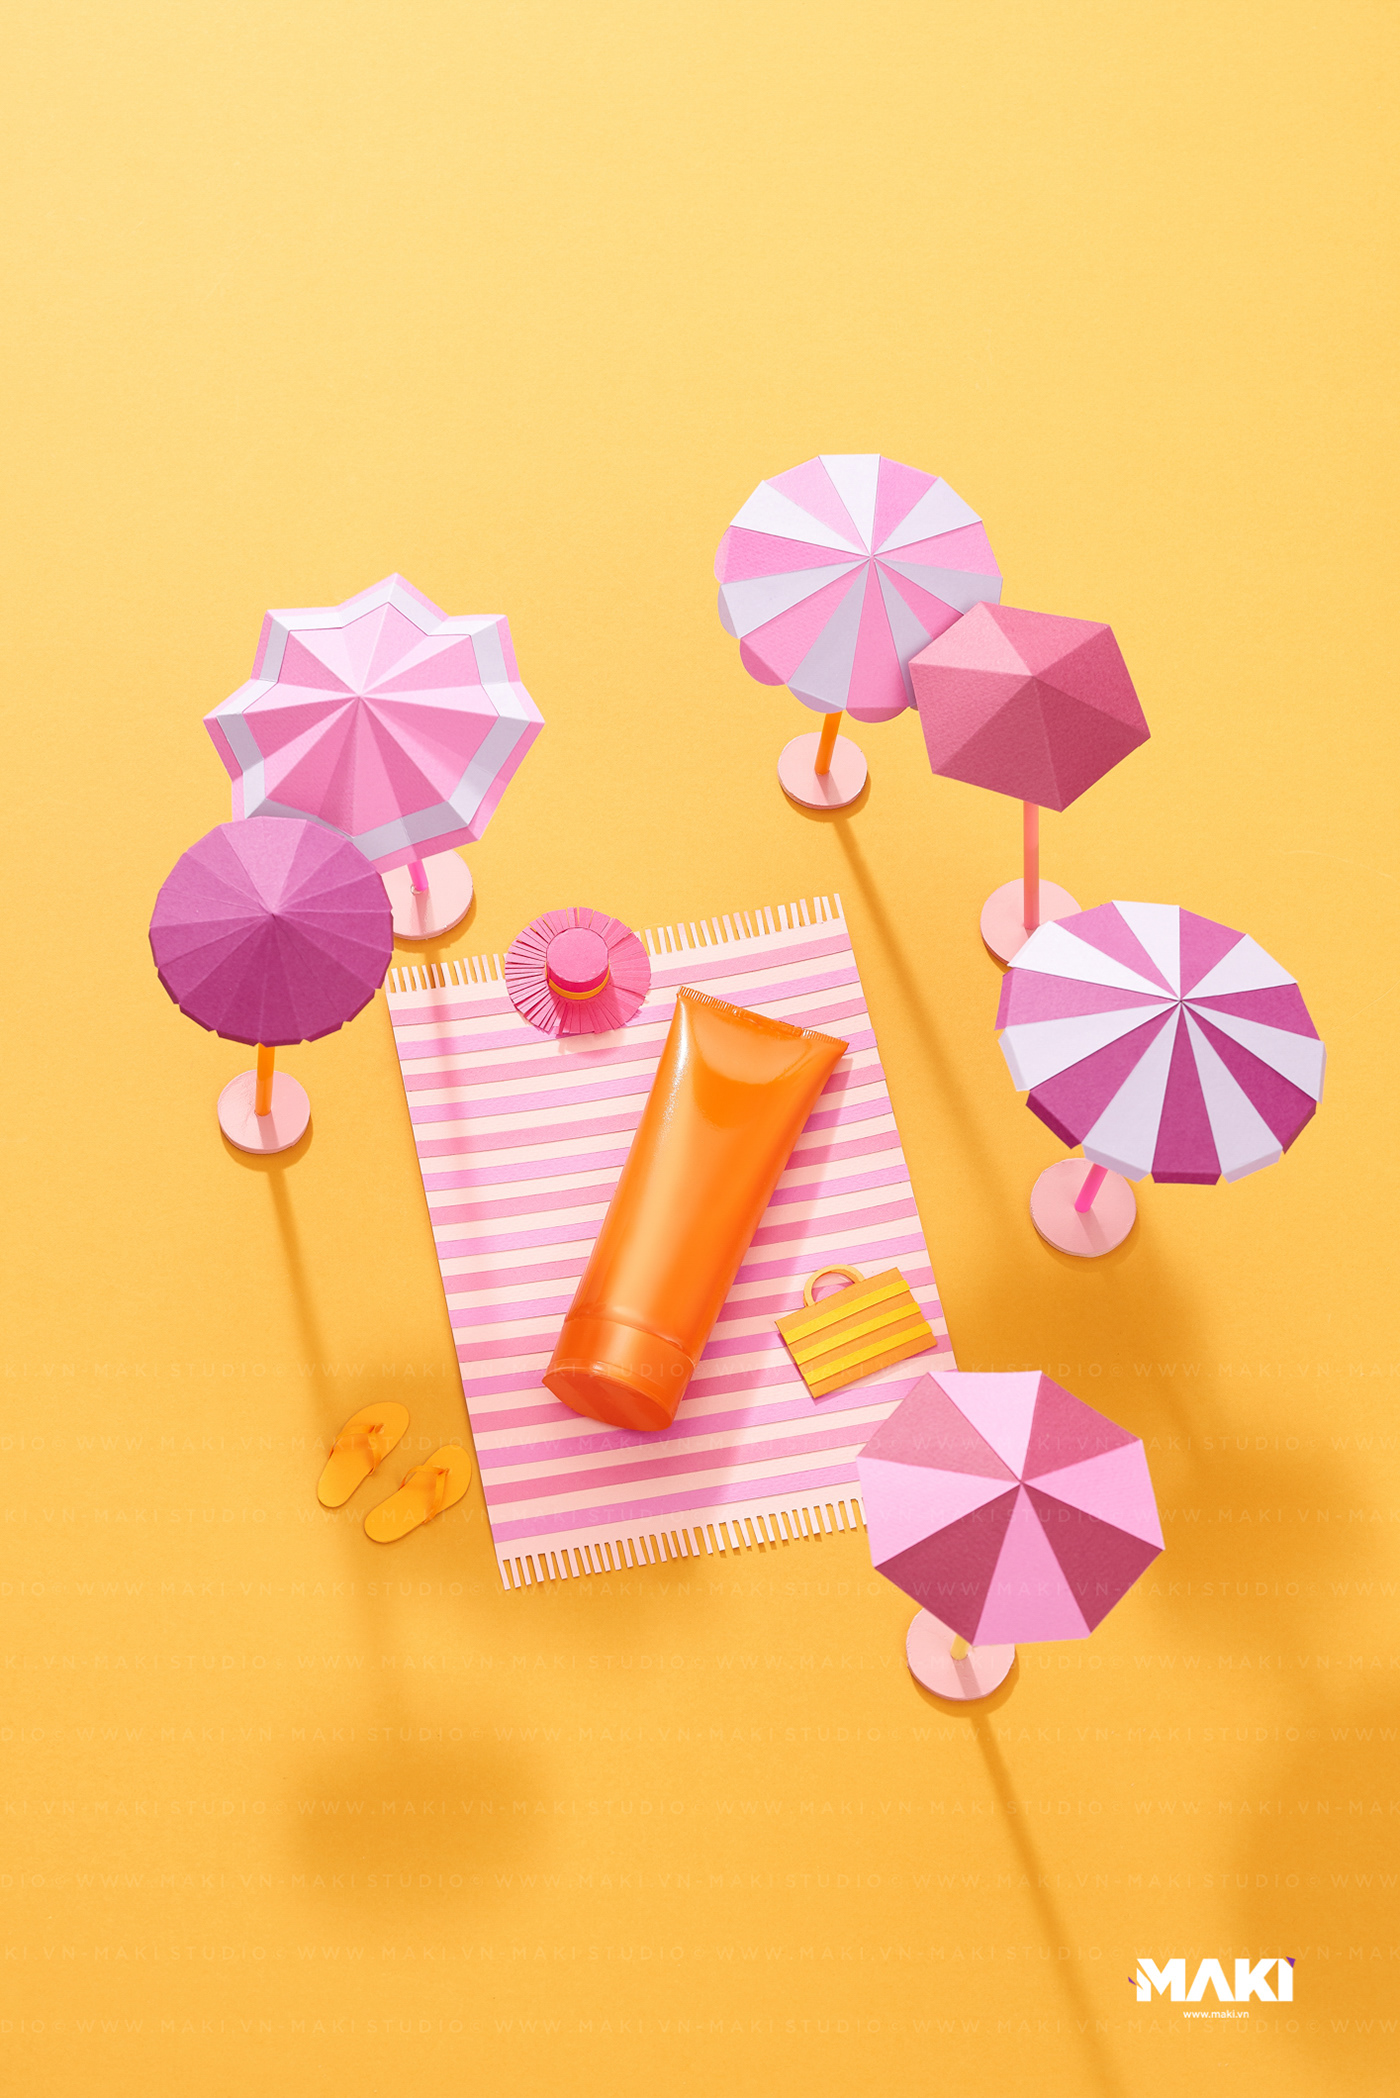 Image may contain: umbrella